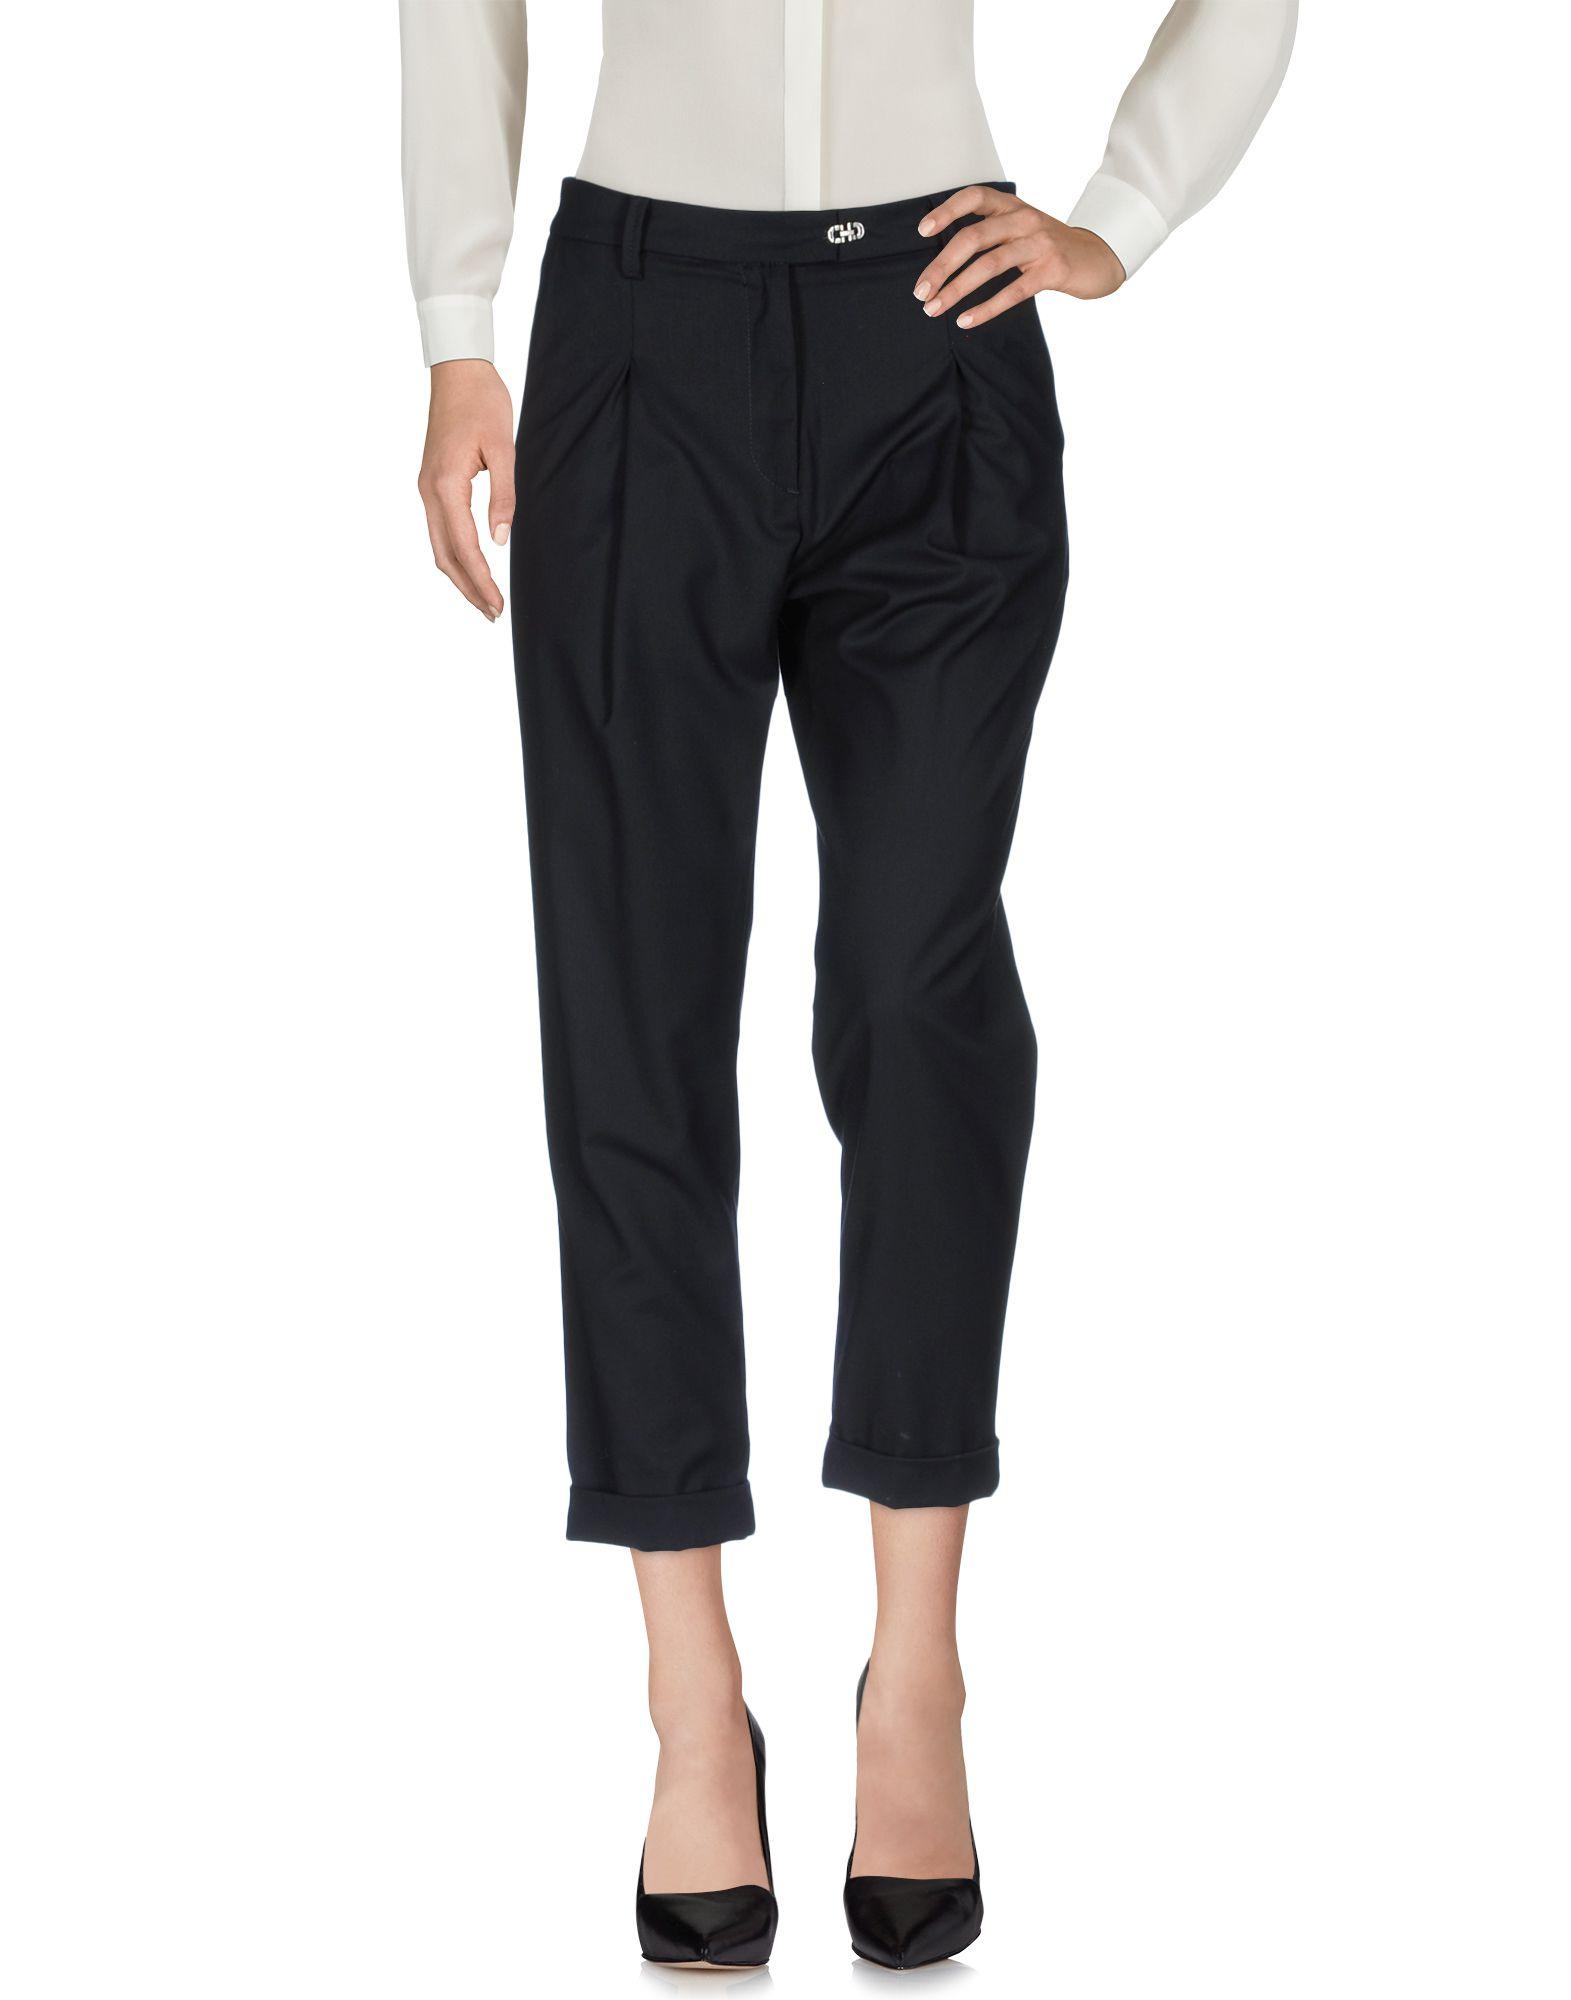 Pantalone Happy25 donna donna donna - 13035420PR 3cf